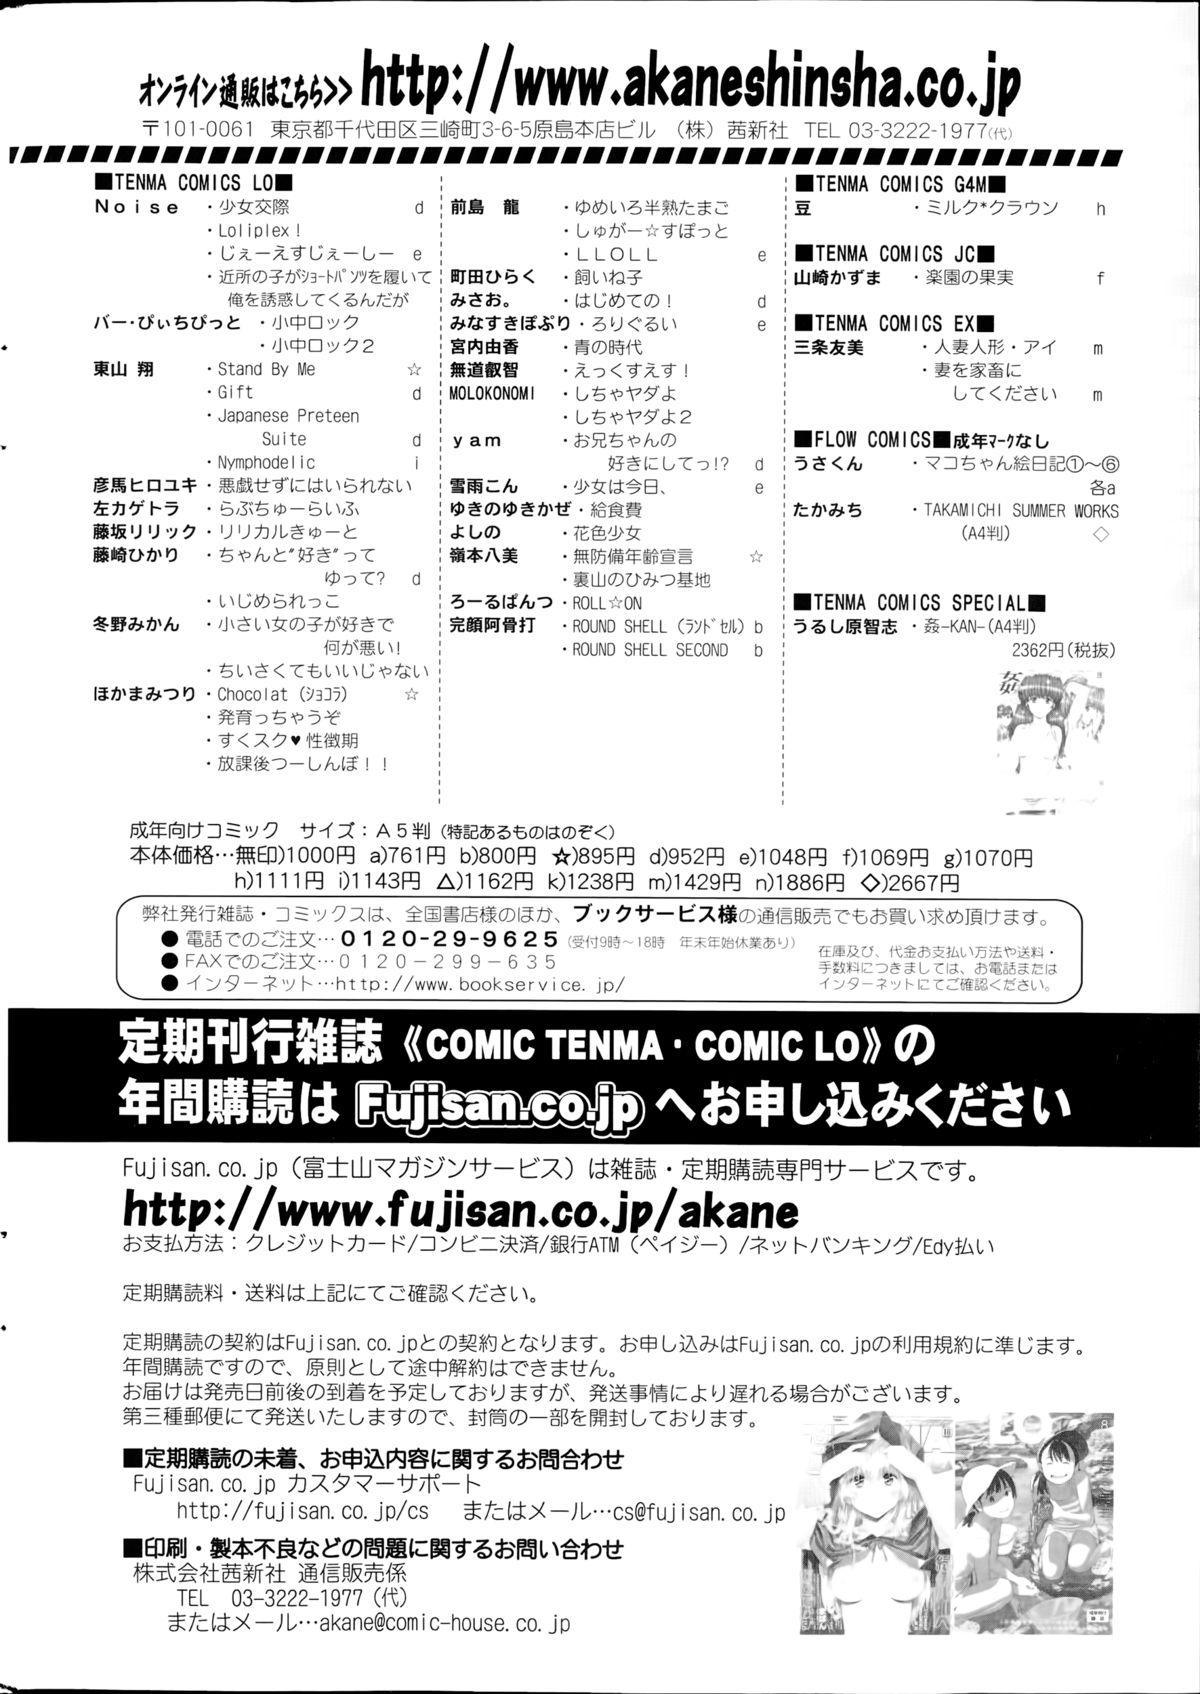 COMIC SIGMA 2014-09 Vol.81 257